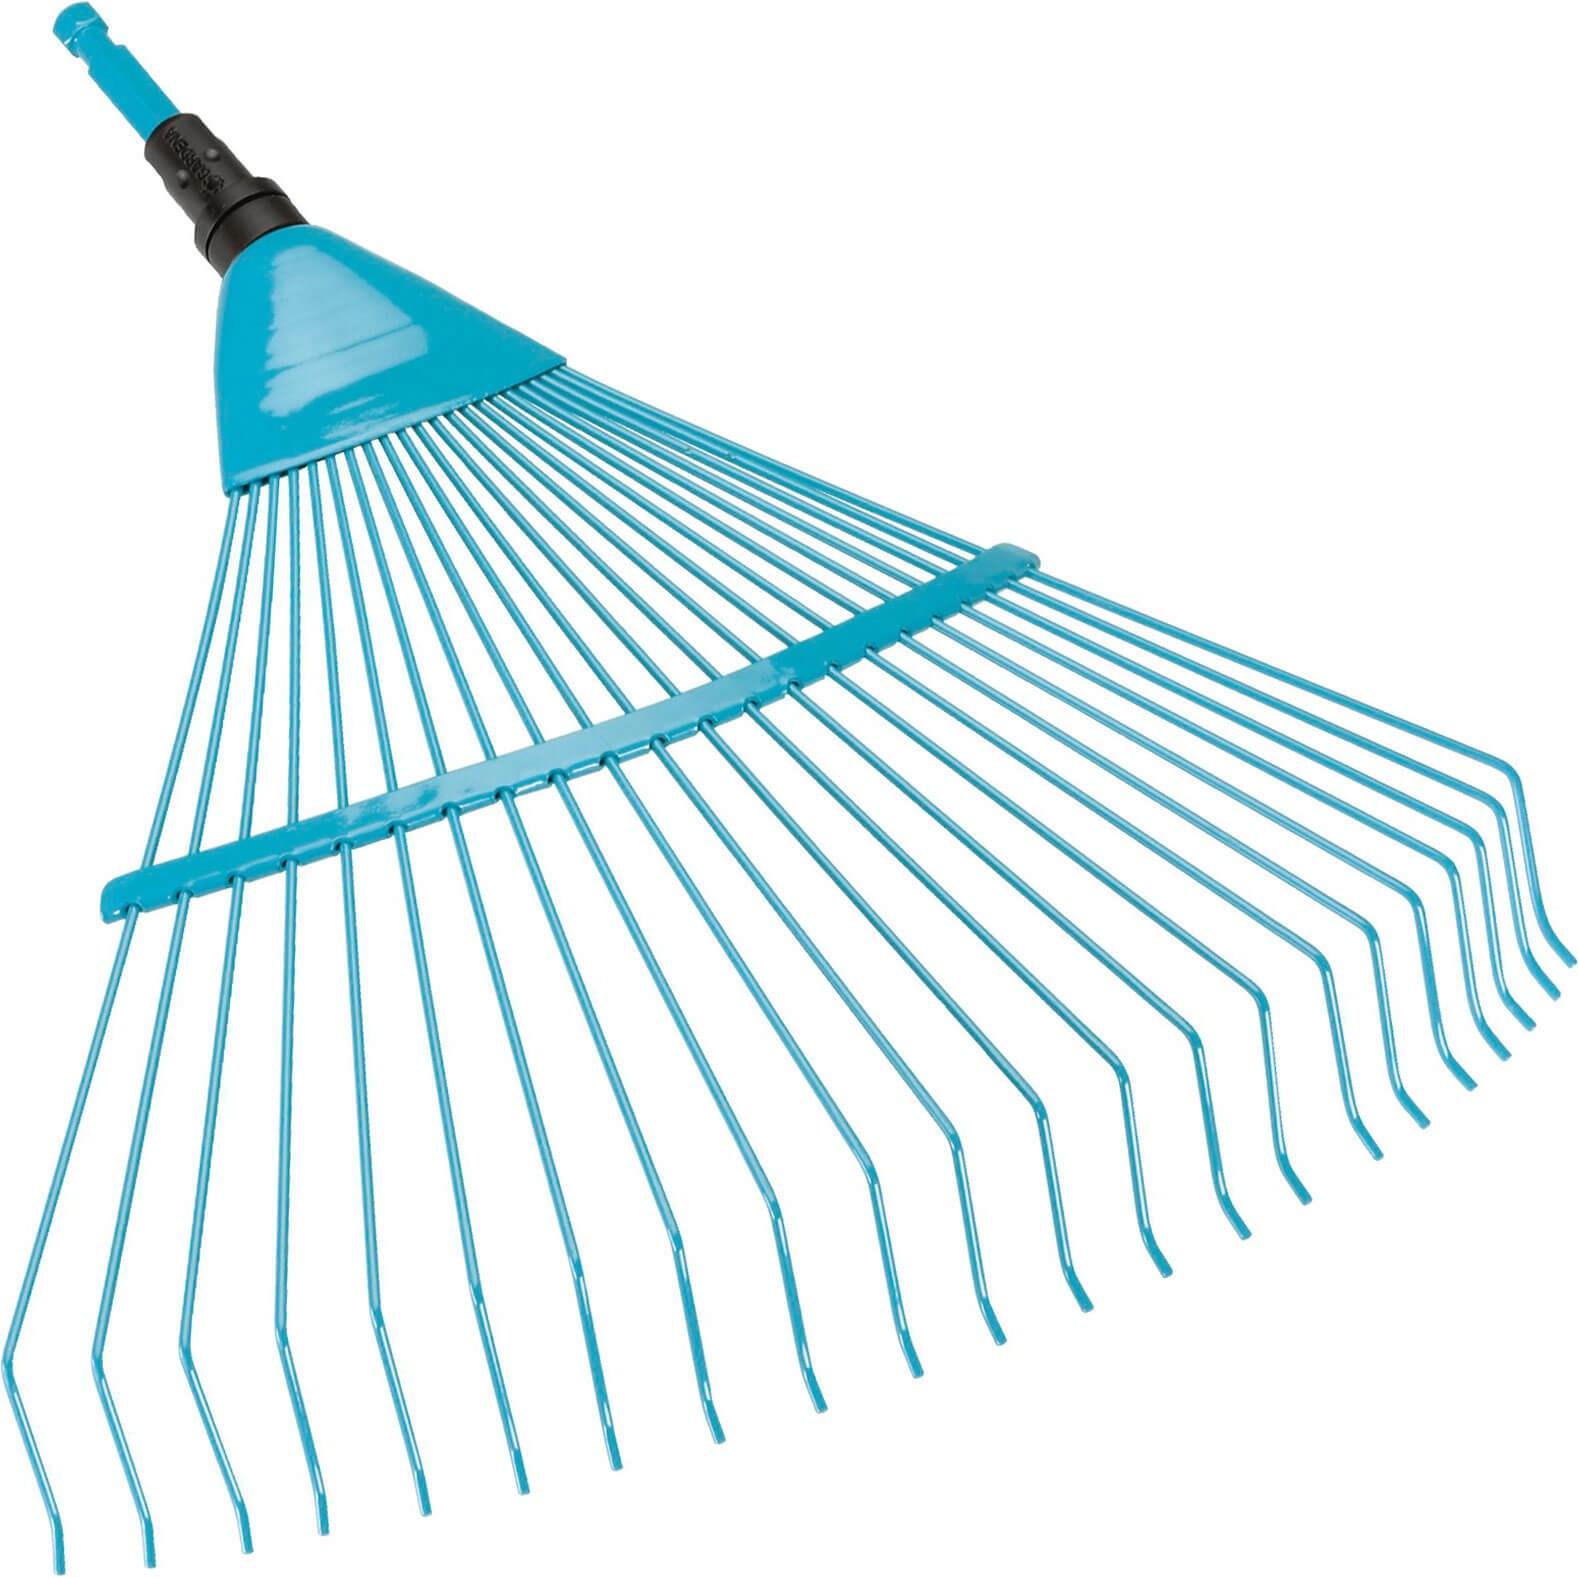 Gardena COMBISYSTEM Spring Wire Rake Head